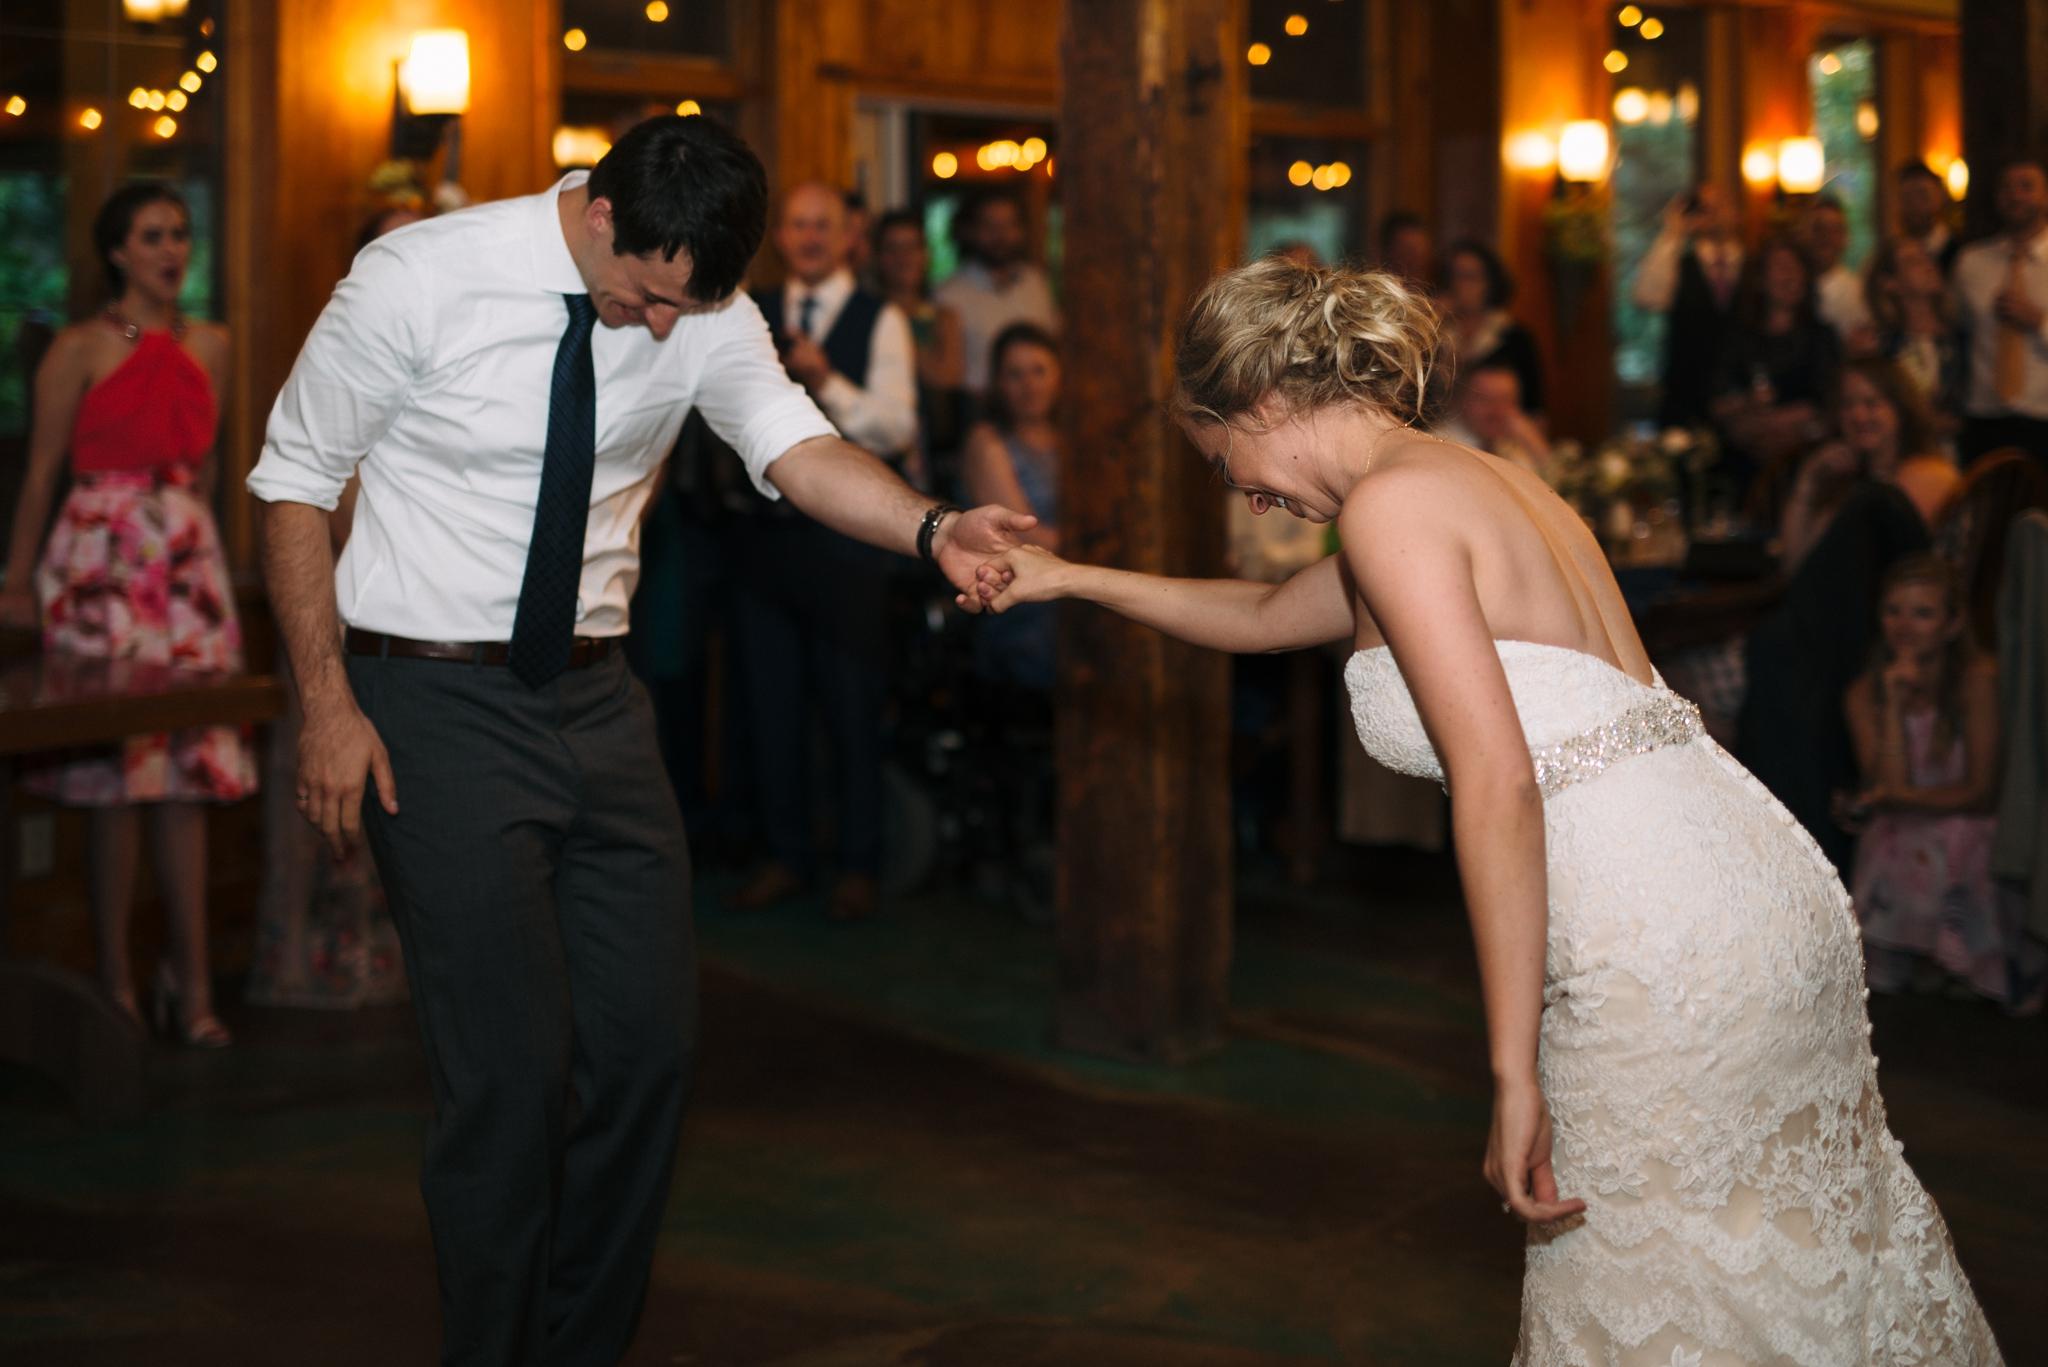 kaihla_tonai_intimate_wedding_elopement_photographer_4308